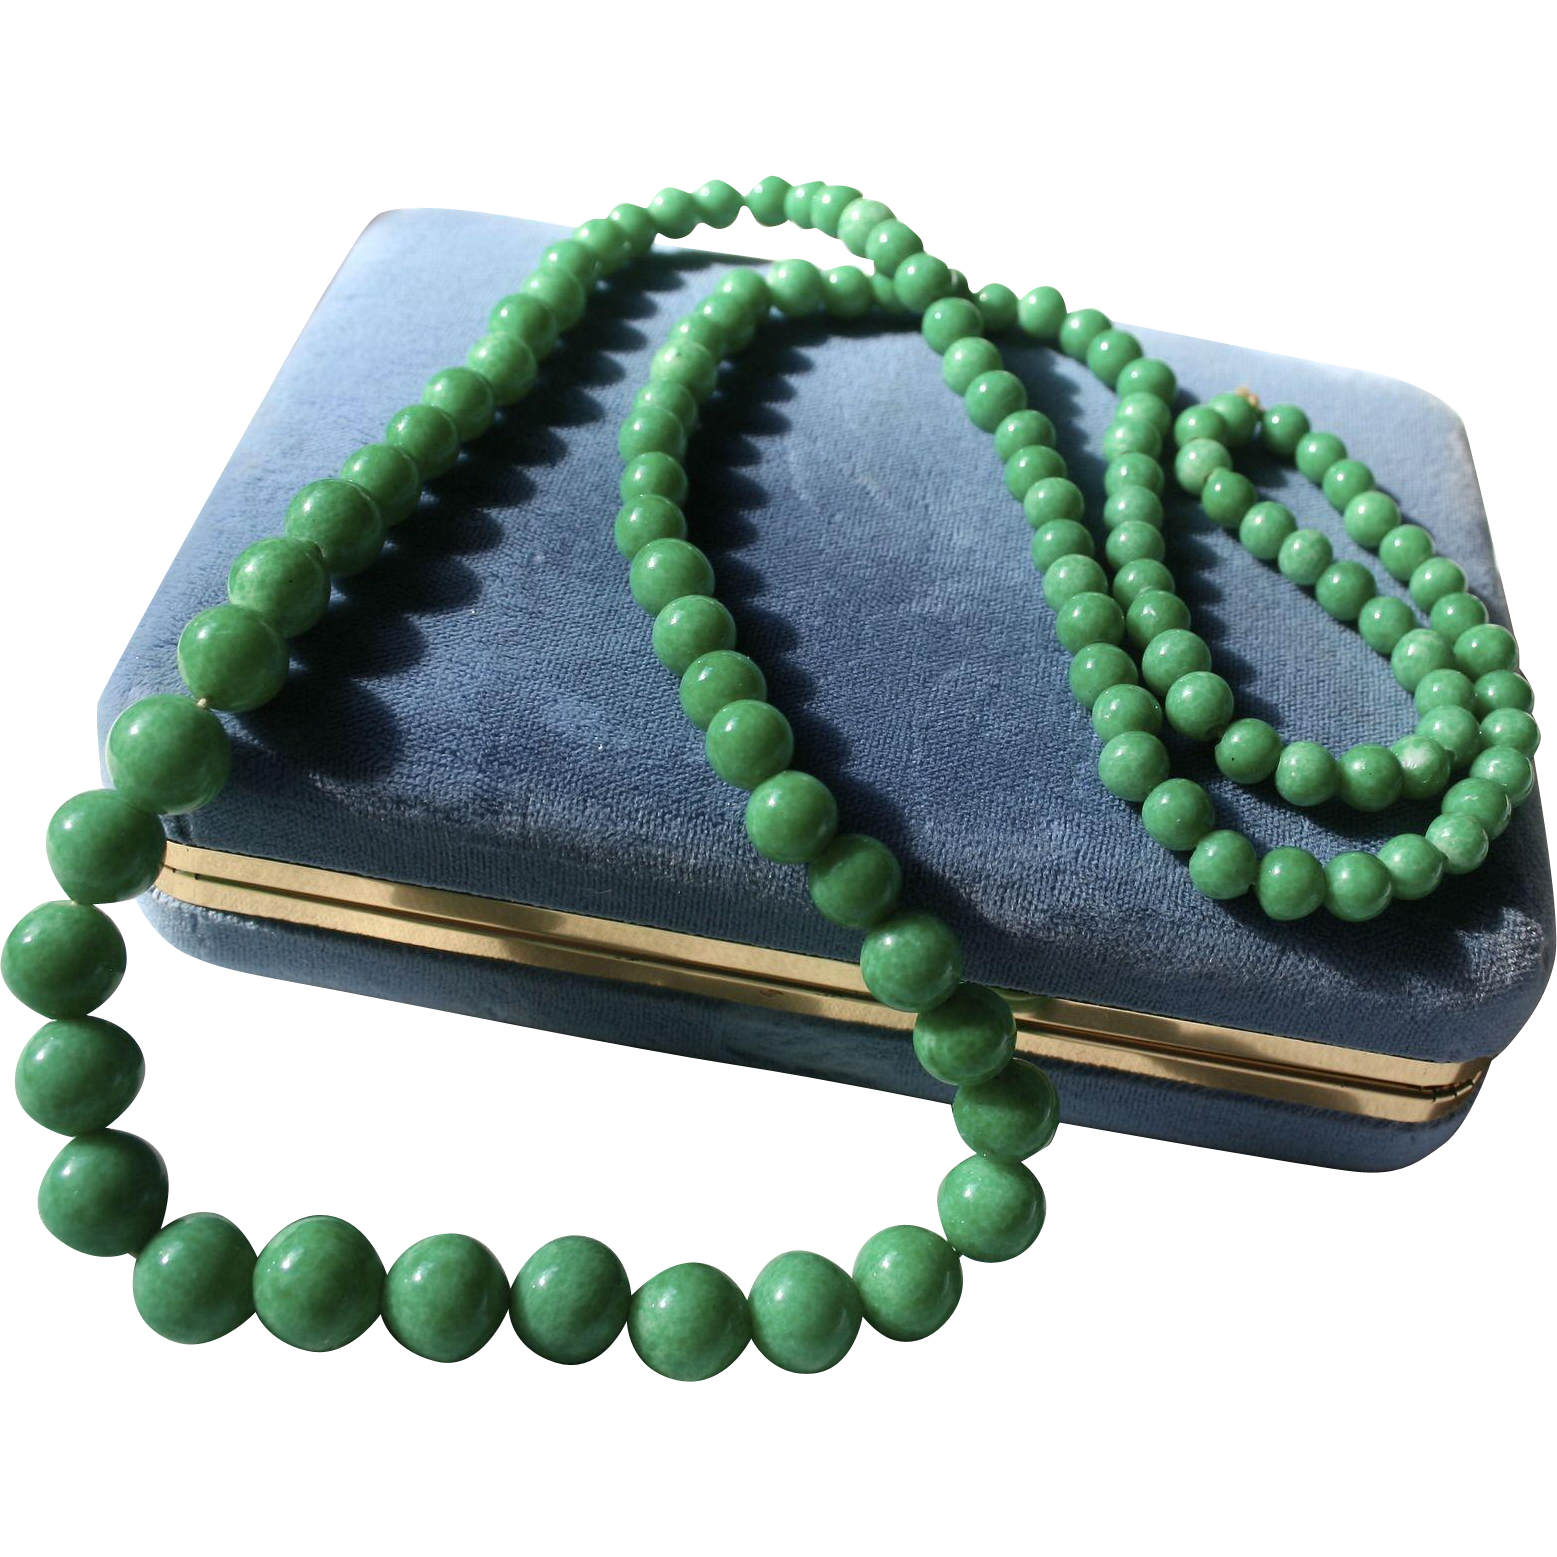 Gorgeous Peking Green Glass Graduated Beaded Necklace Random Harvest Ruby Lane